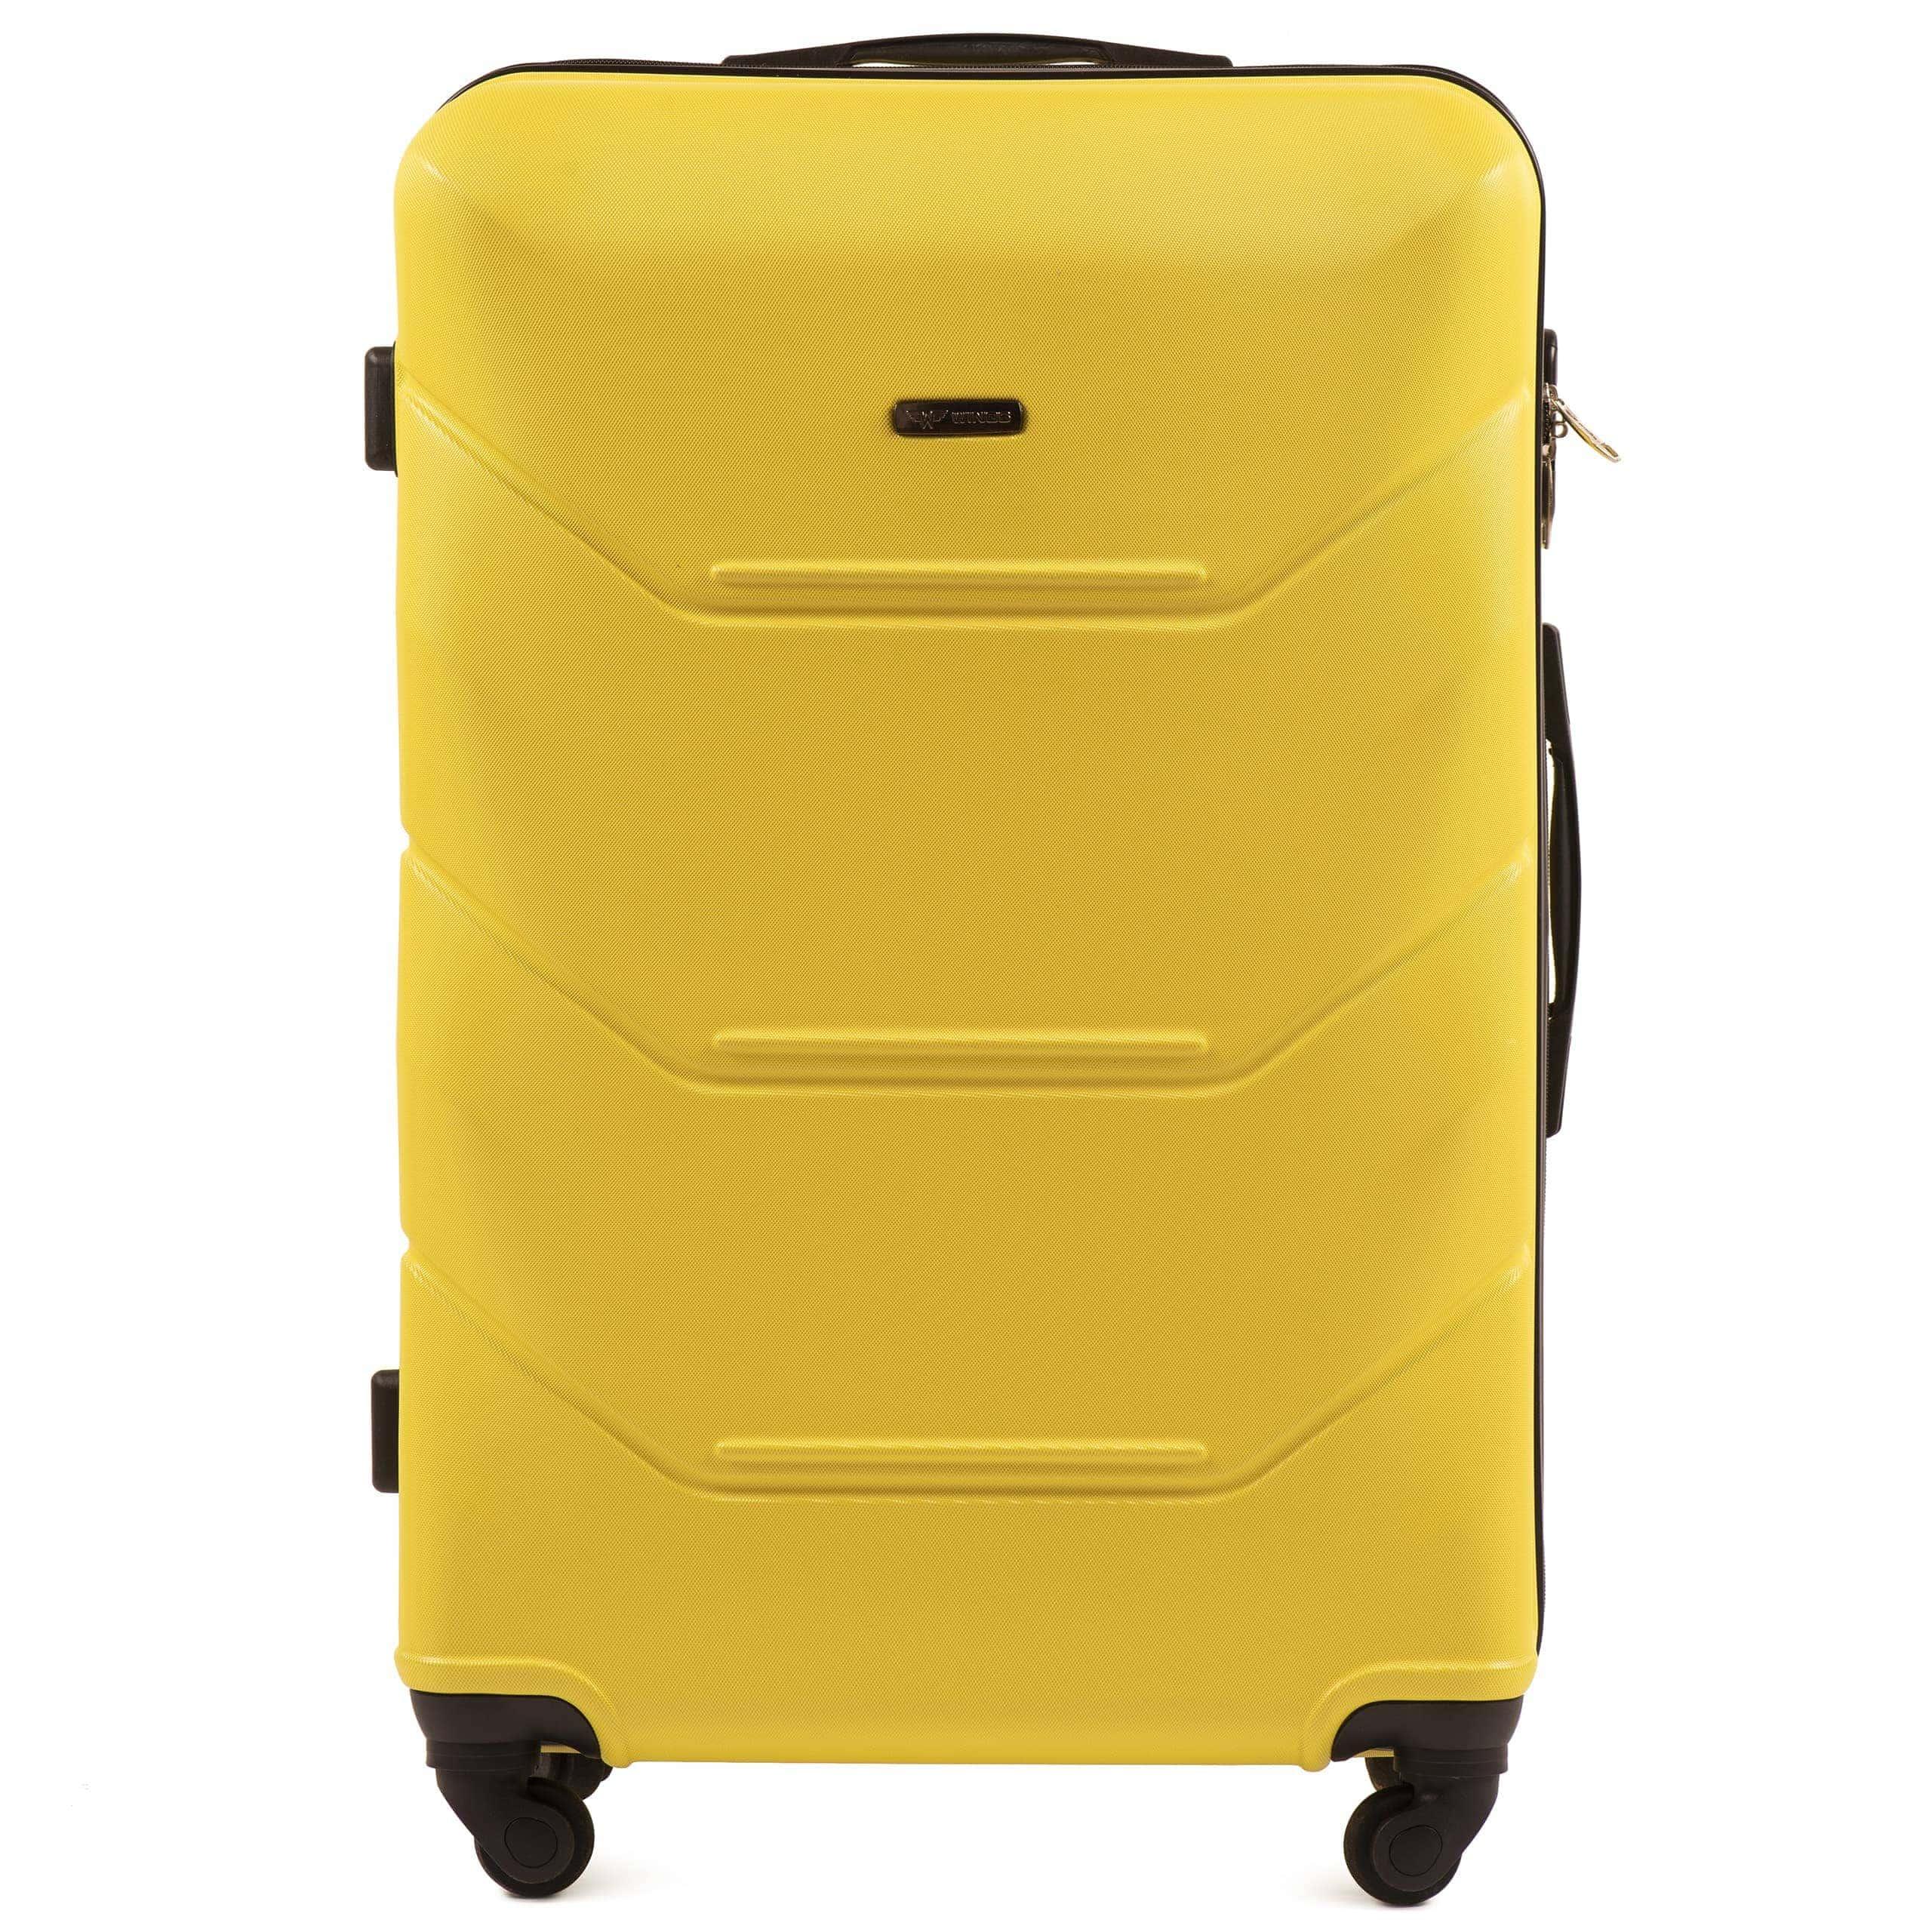 БОЛЬШОЙ ЧЕМОДАН WINGS 147 L YELLOW PREMIUM НА 4-Х КАУЧУКОВЫХ КОЛЕСАХ! Для багажа ,до 23 кг